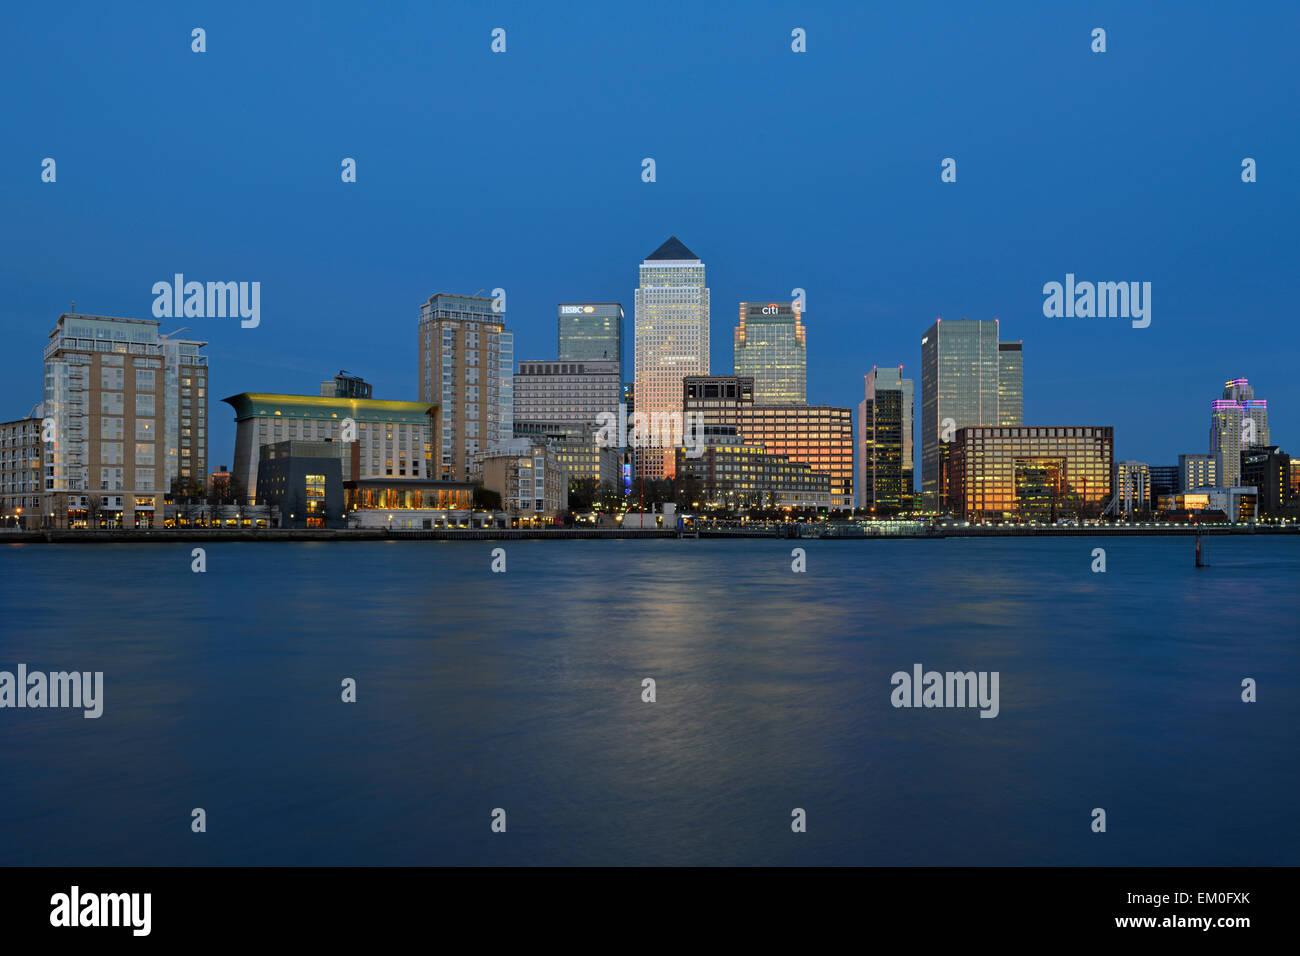 Canary Riverside, Canary Wharf Estate, Isle of Dogs, Docklands, London E14, United Kingdom - Stock Image